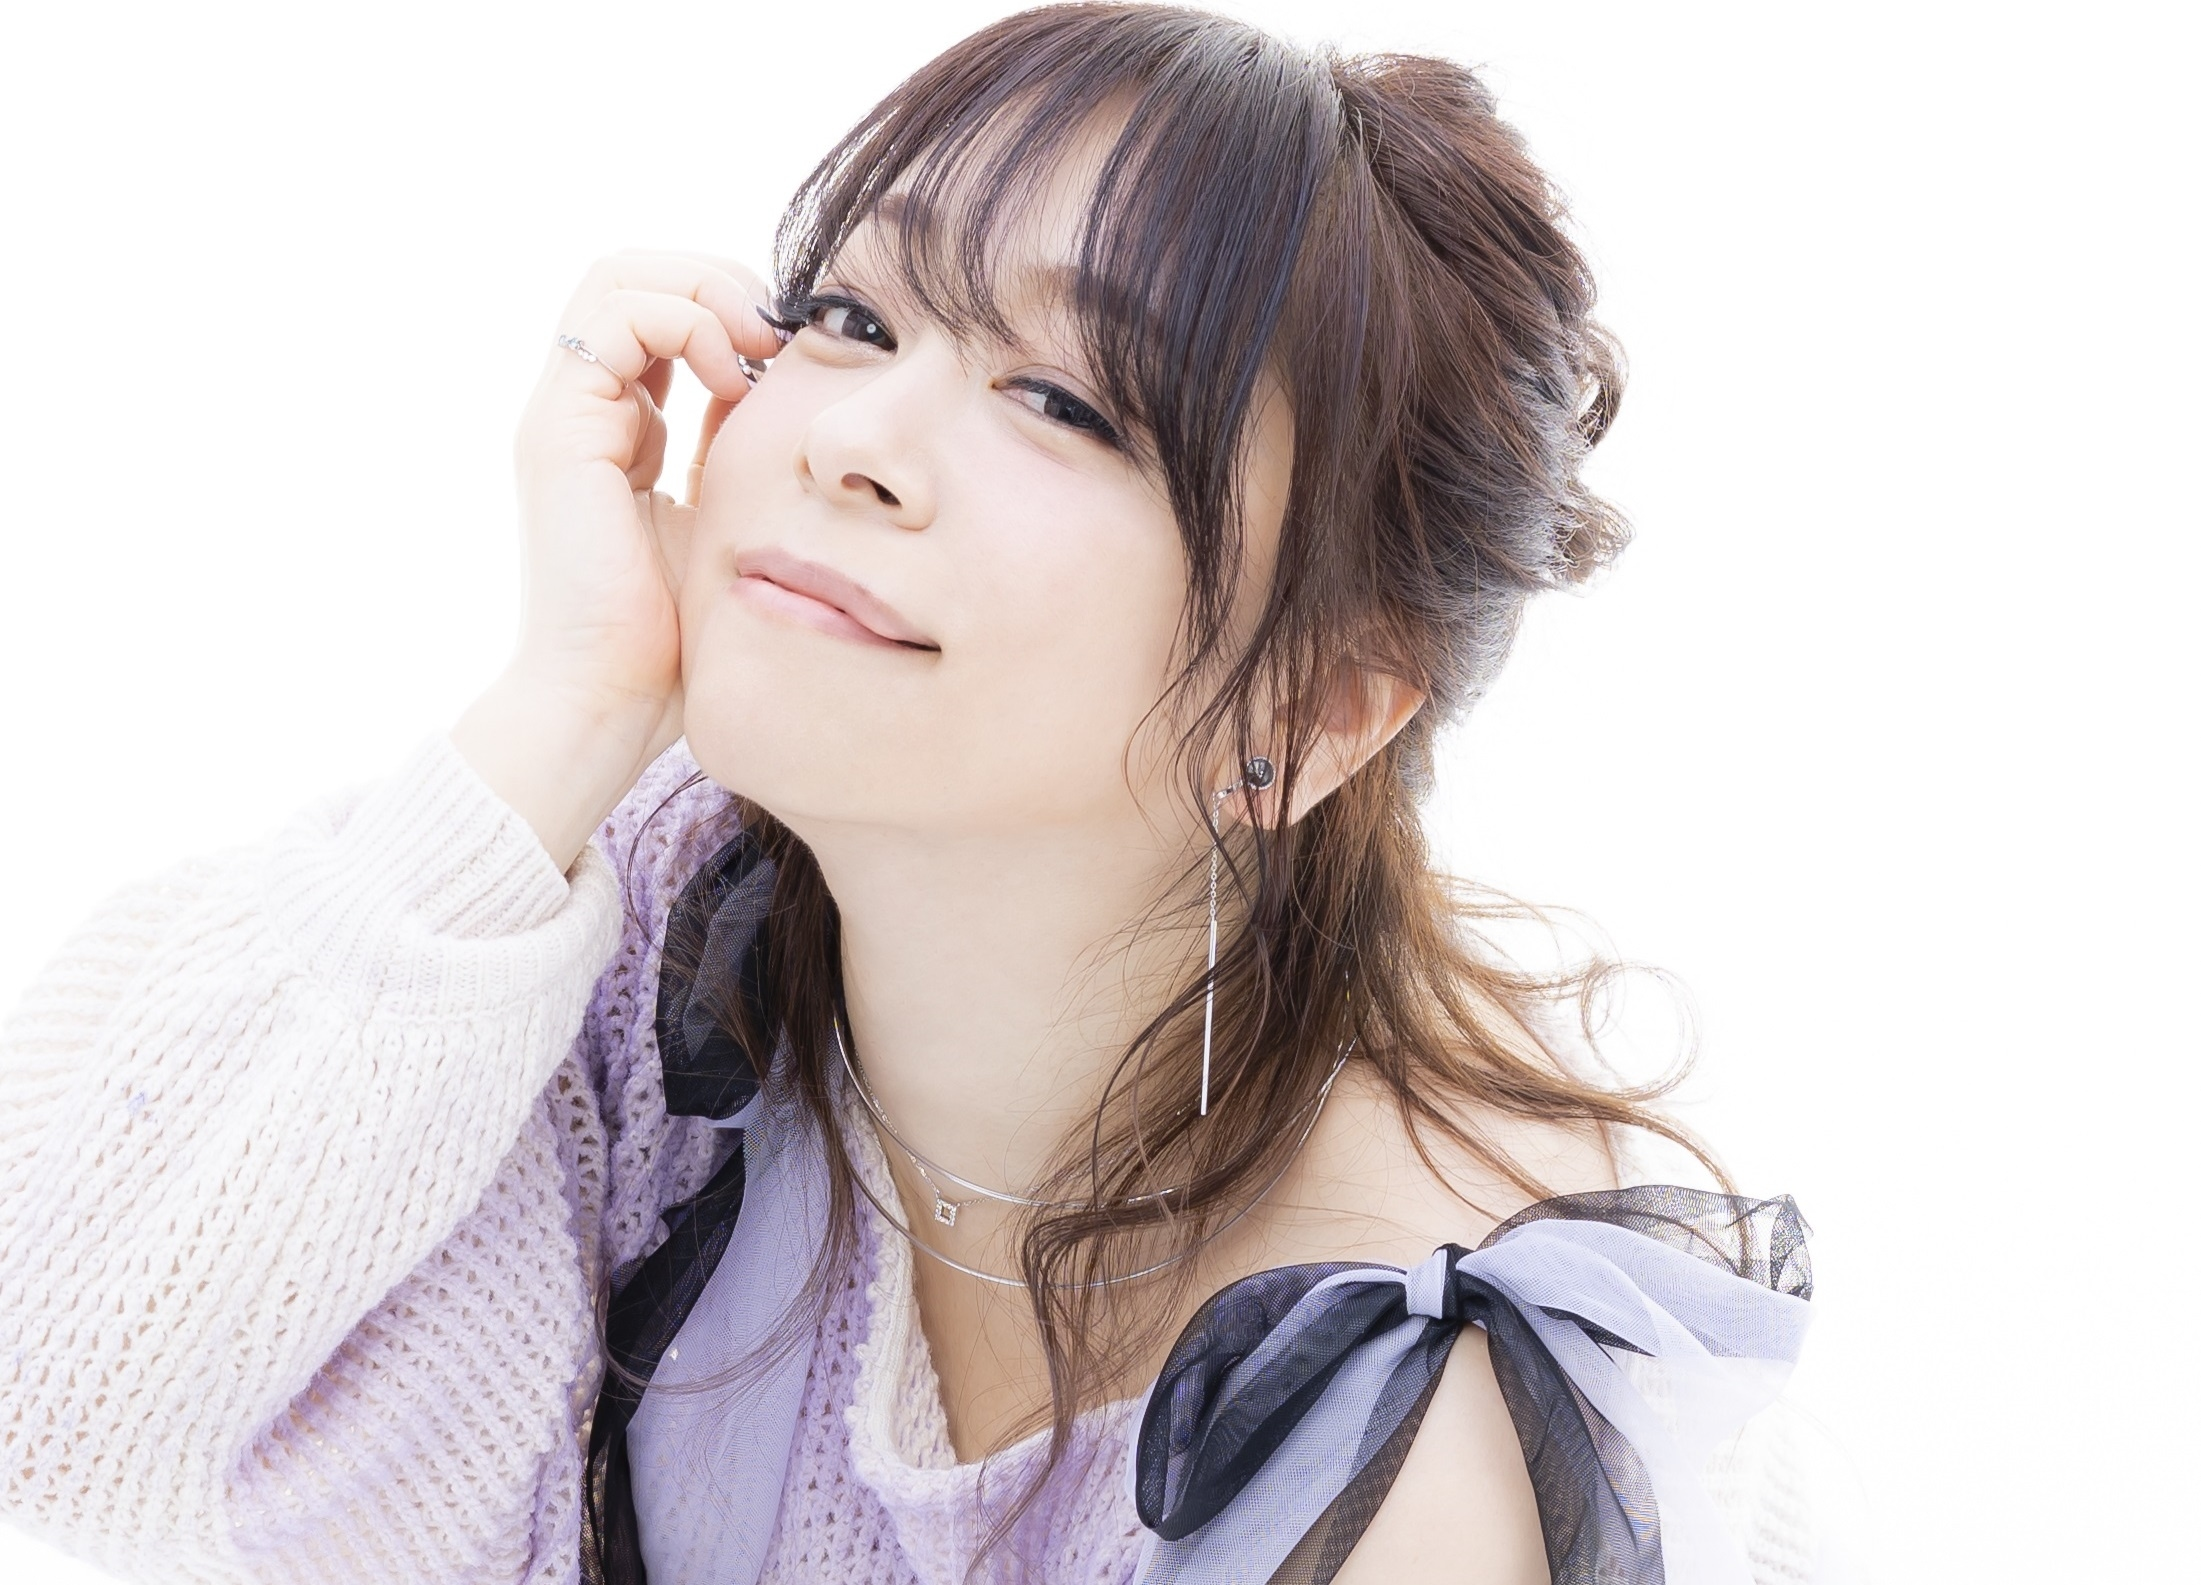 KOTOKO ゲームソング134曲収録CD-BOX 4/21発売